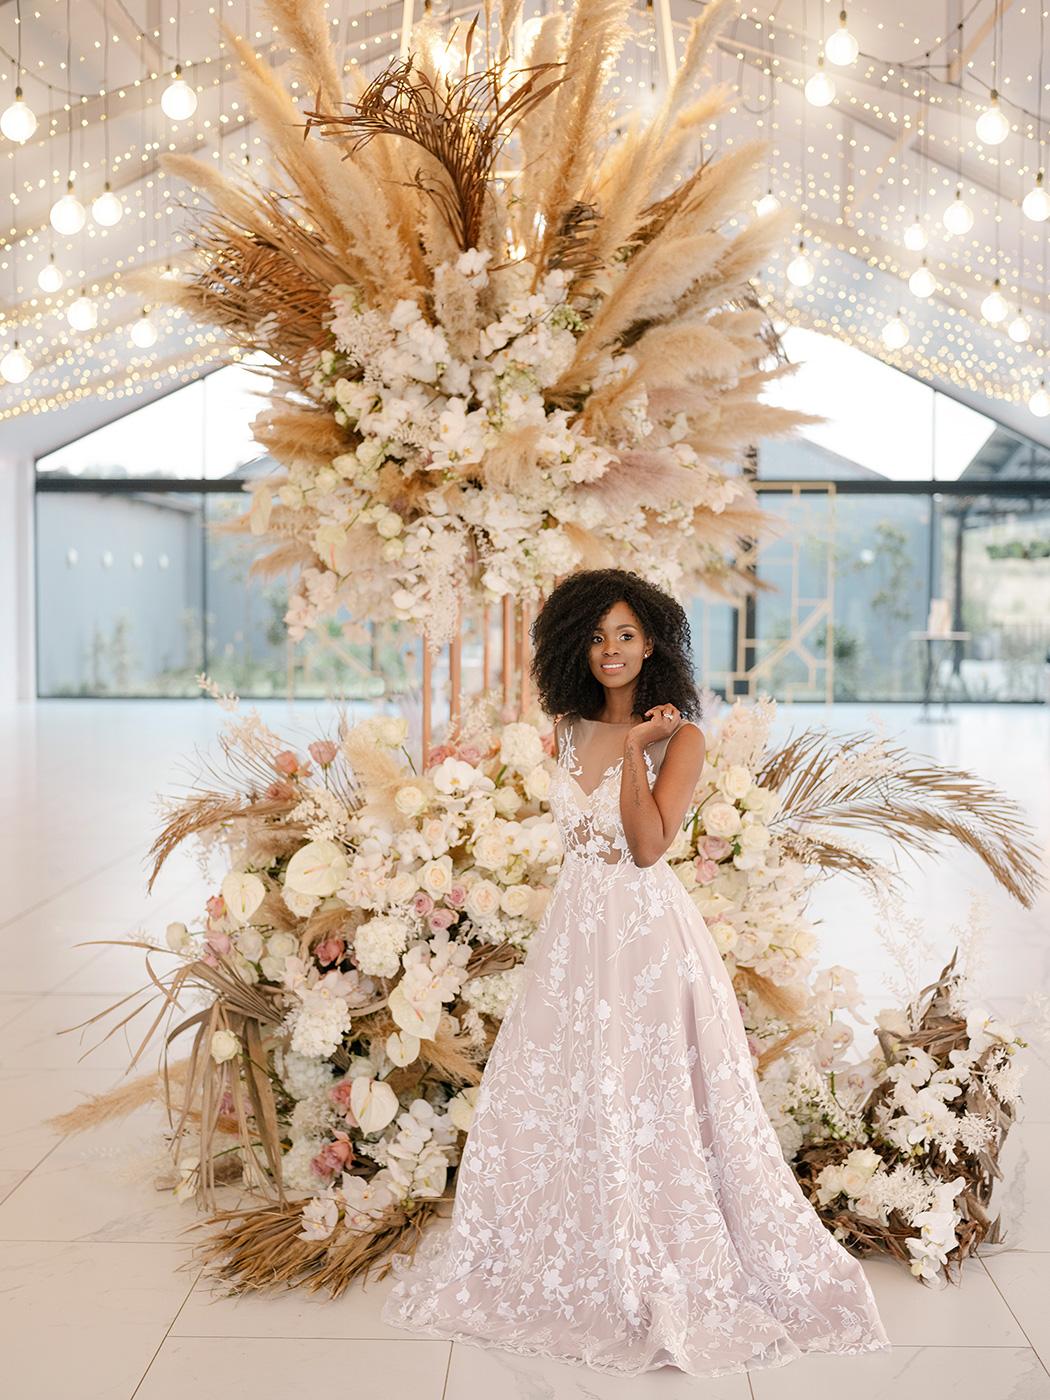 Wedding Ambiance | Inimitable Venue | Rensche Mari